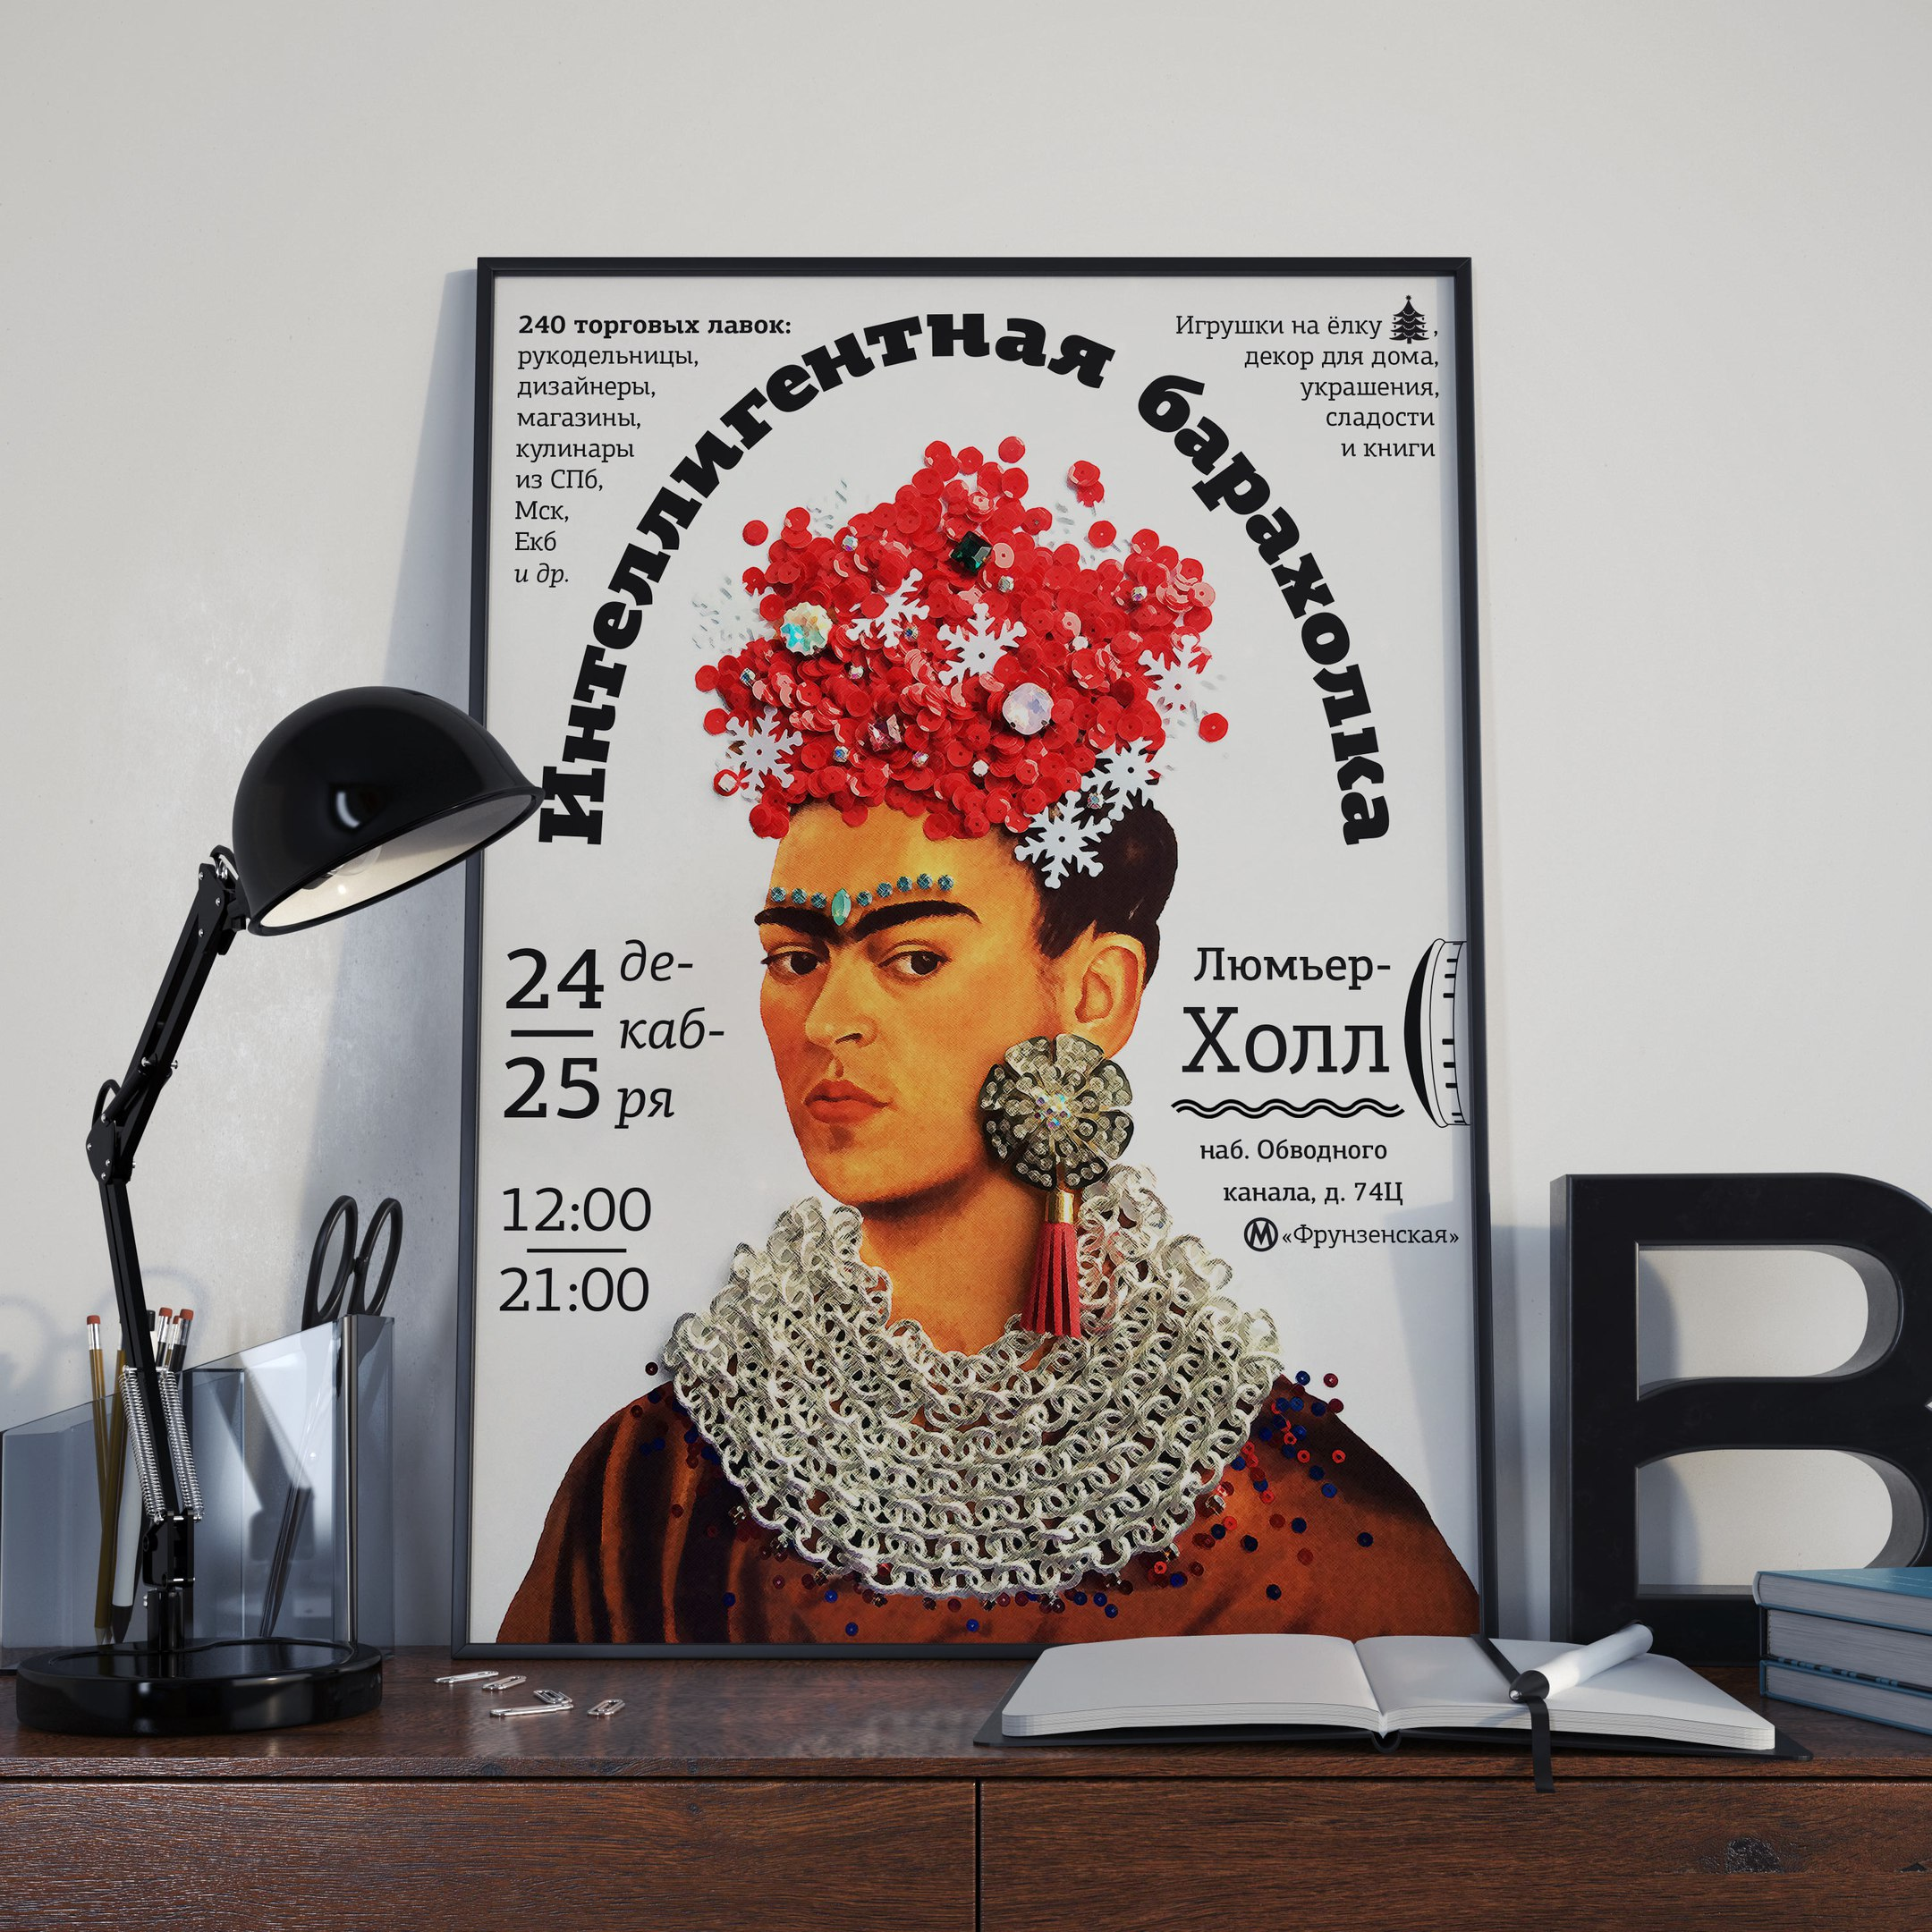 Плакат к «Интеллигентной барахолке»